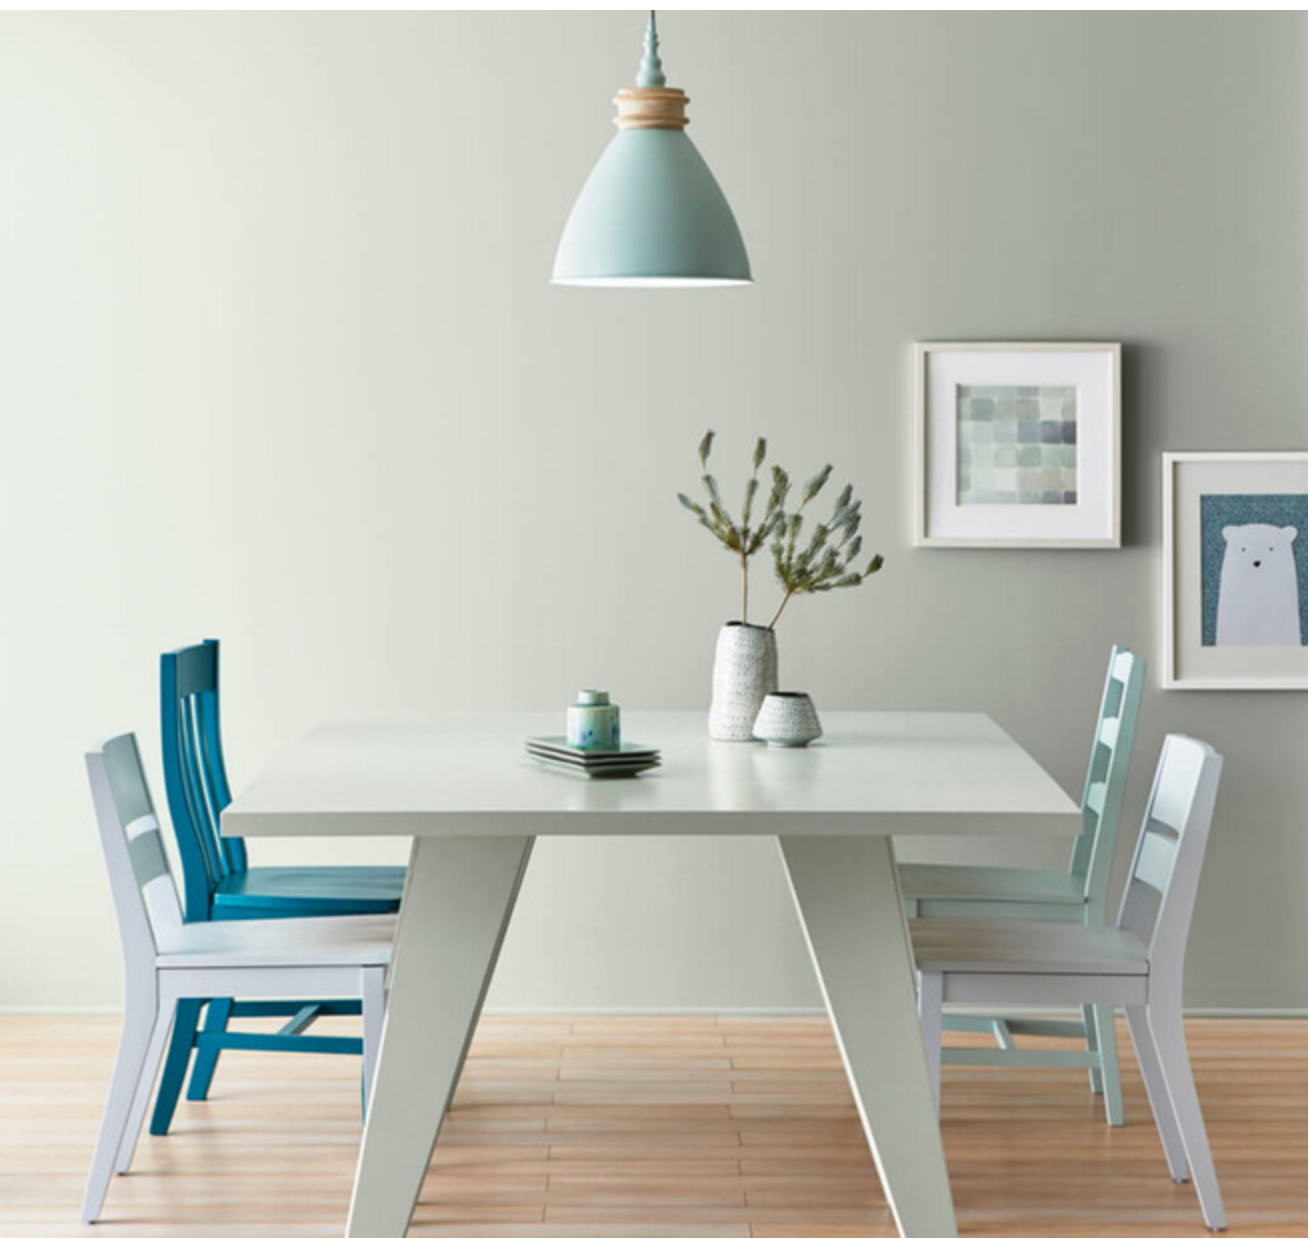 valspar paint soft silver sage beige dining room on valspar paint colors interior id=85638